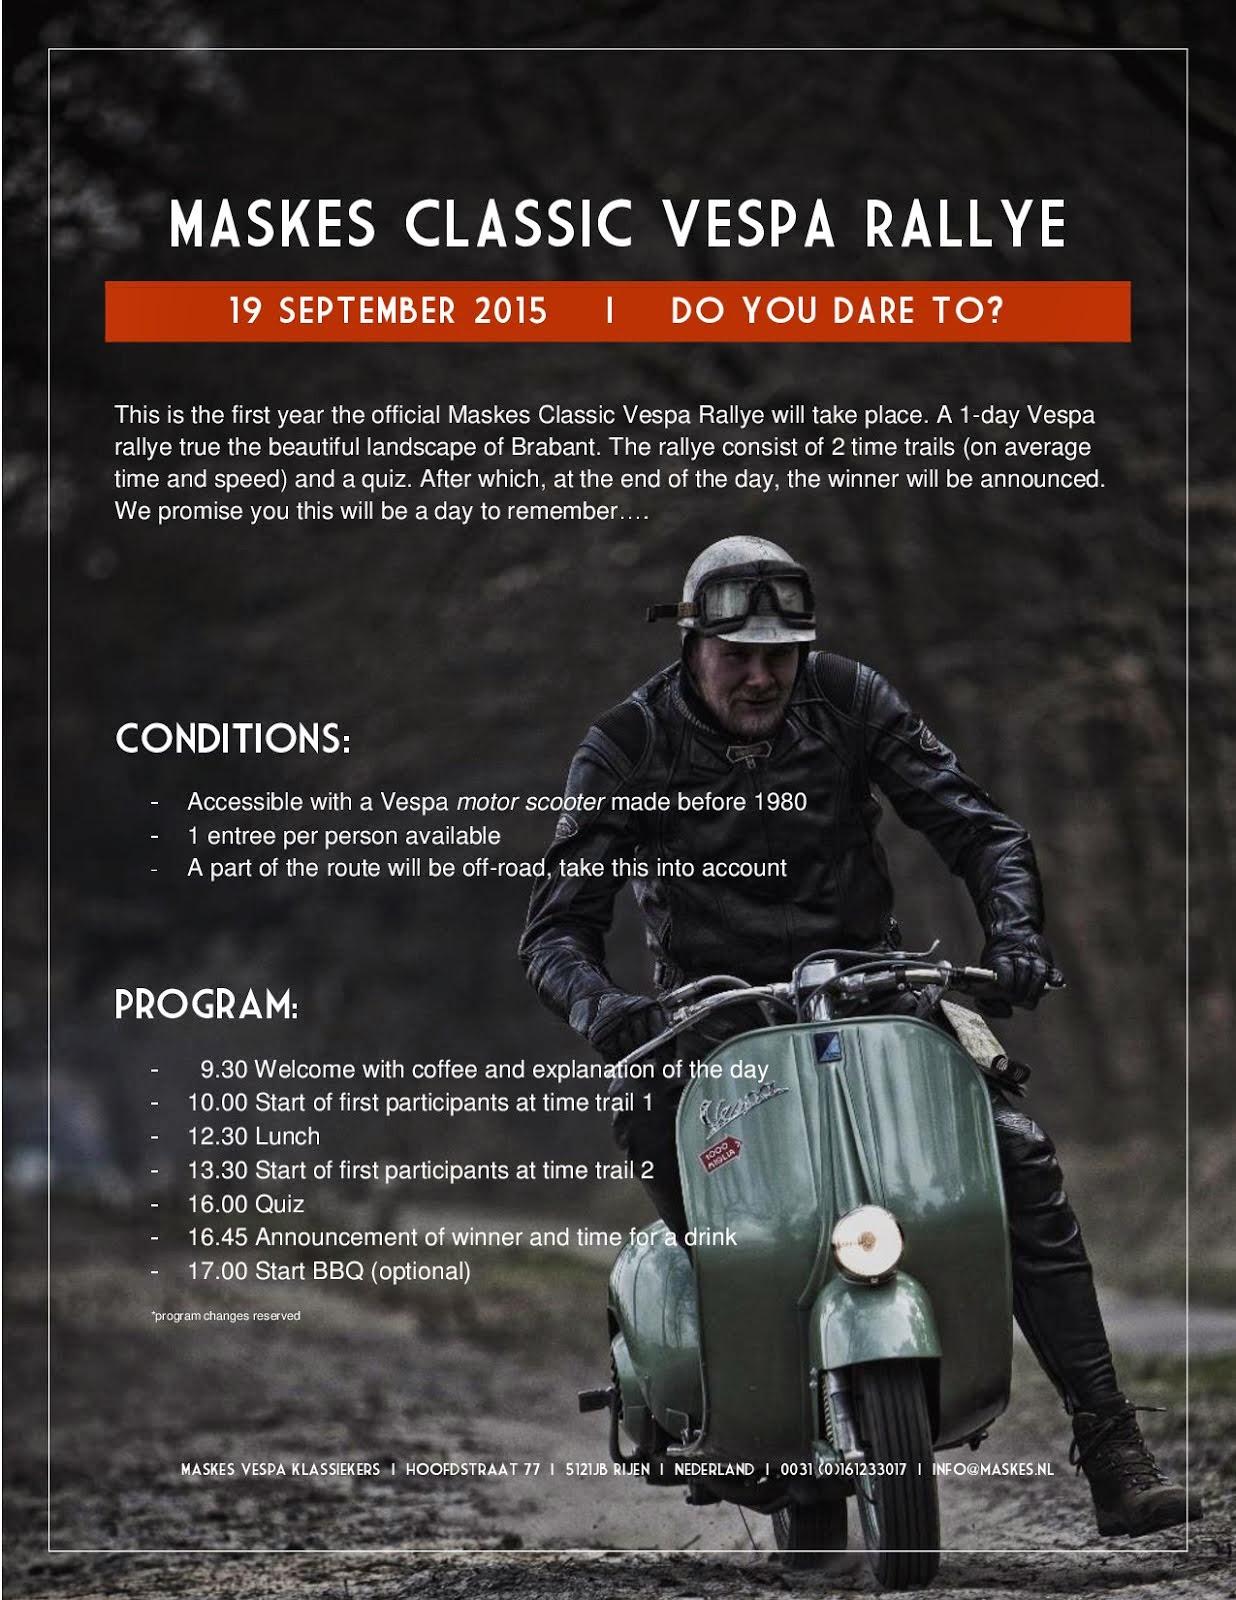 Maskes classic vespa rally